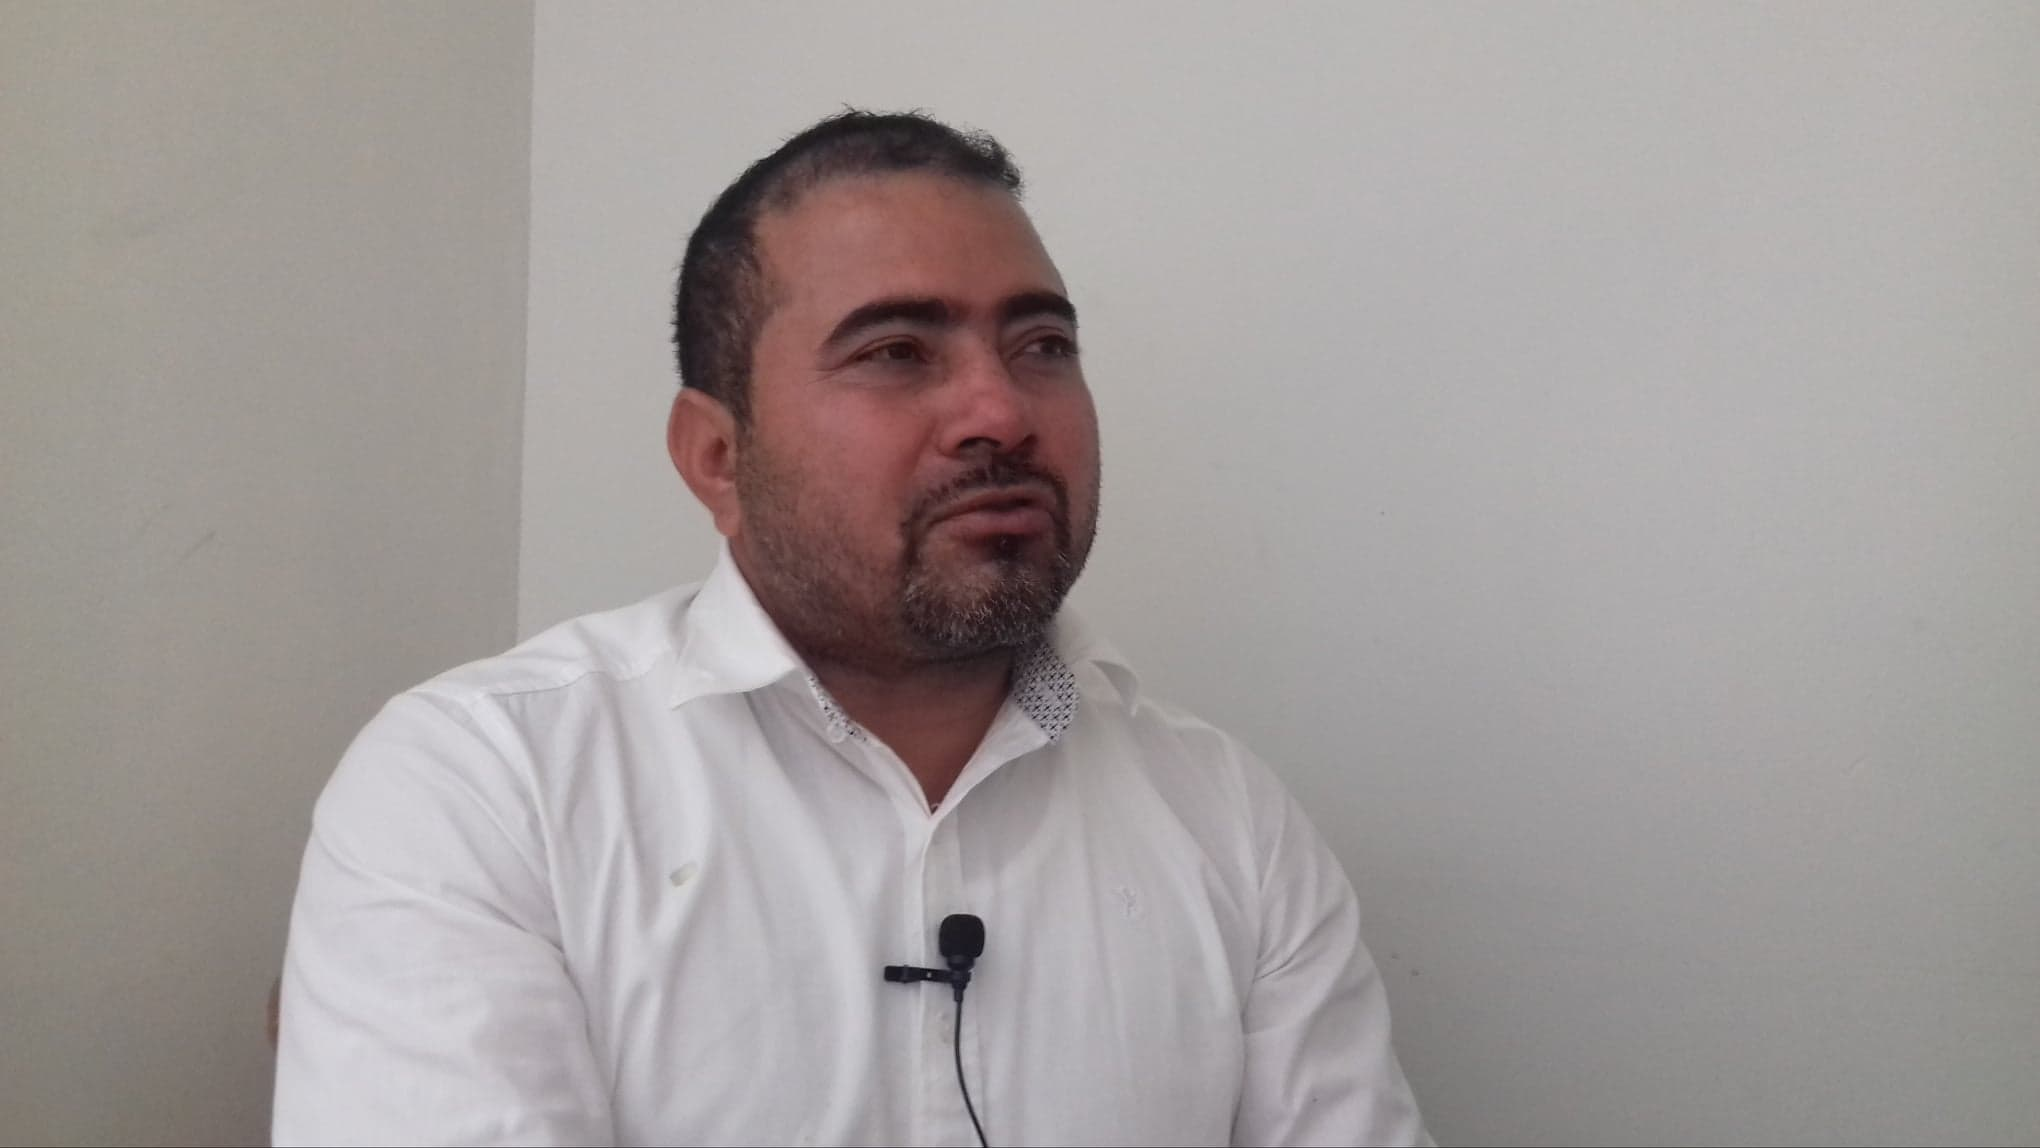 Manuel Gil rebasó tope de campaña en Tepeojuma: INE